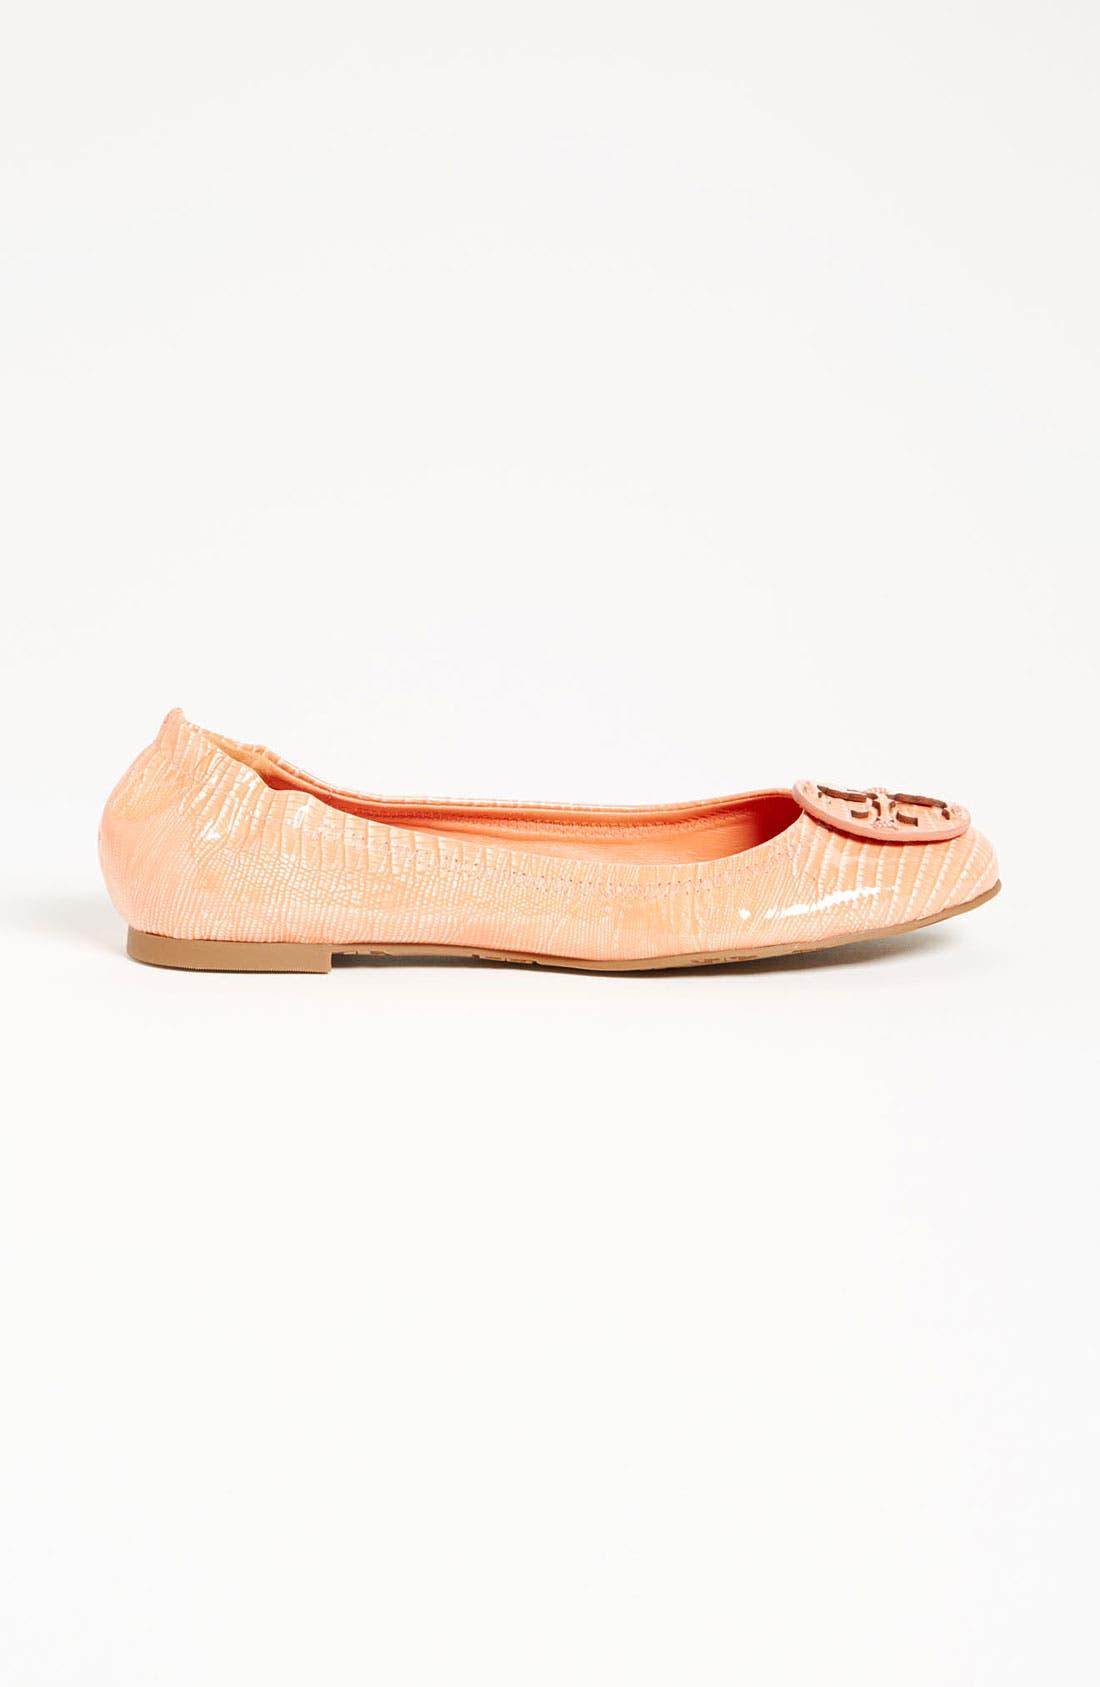 'Reva' Ballerina Flat,                             Main thumbnail 1, color,                             001